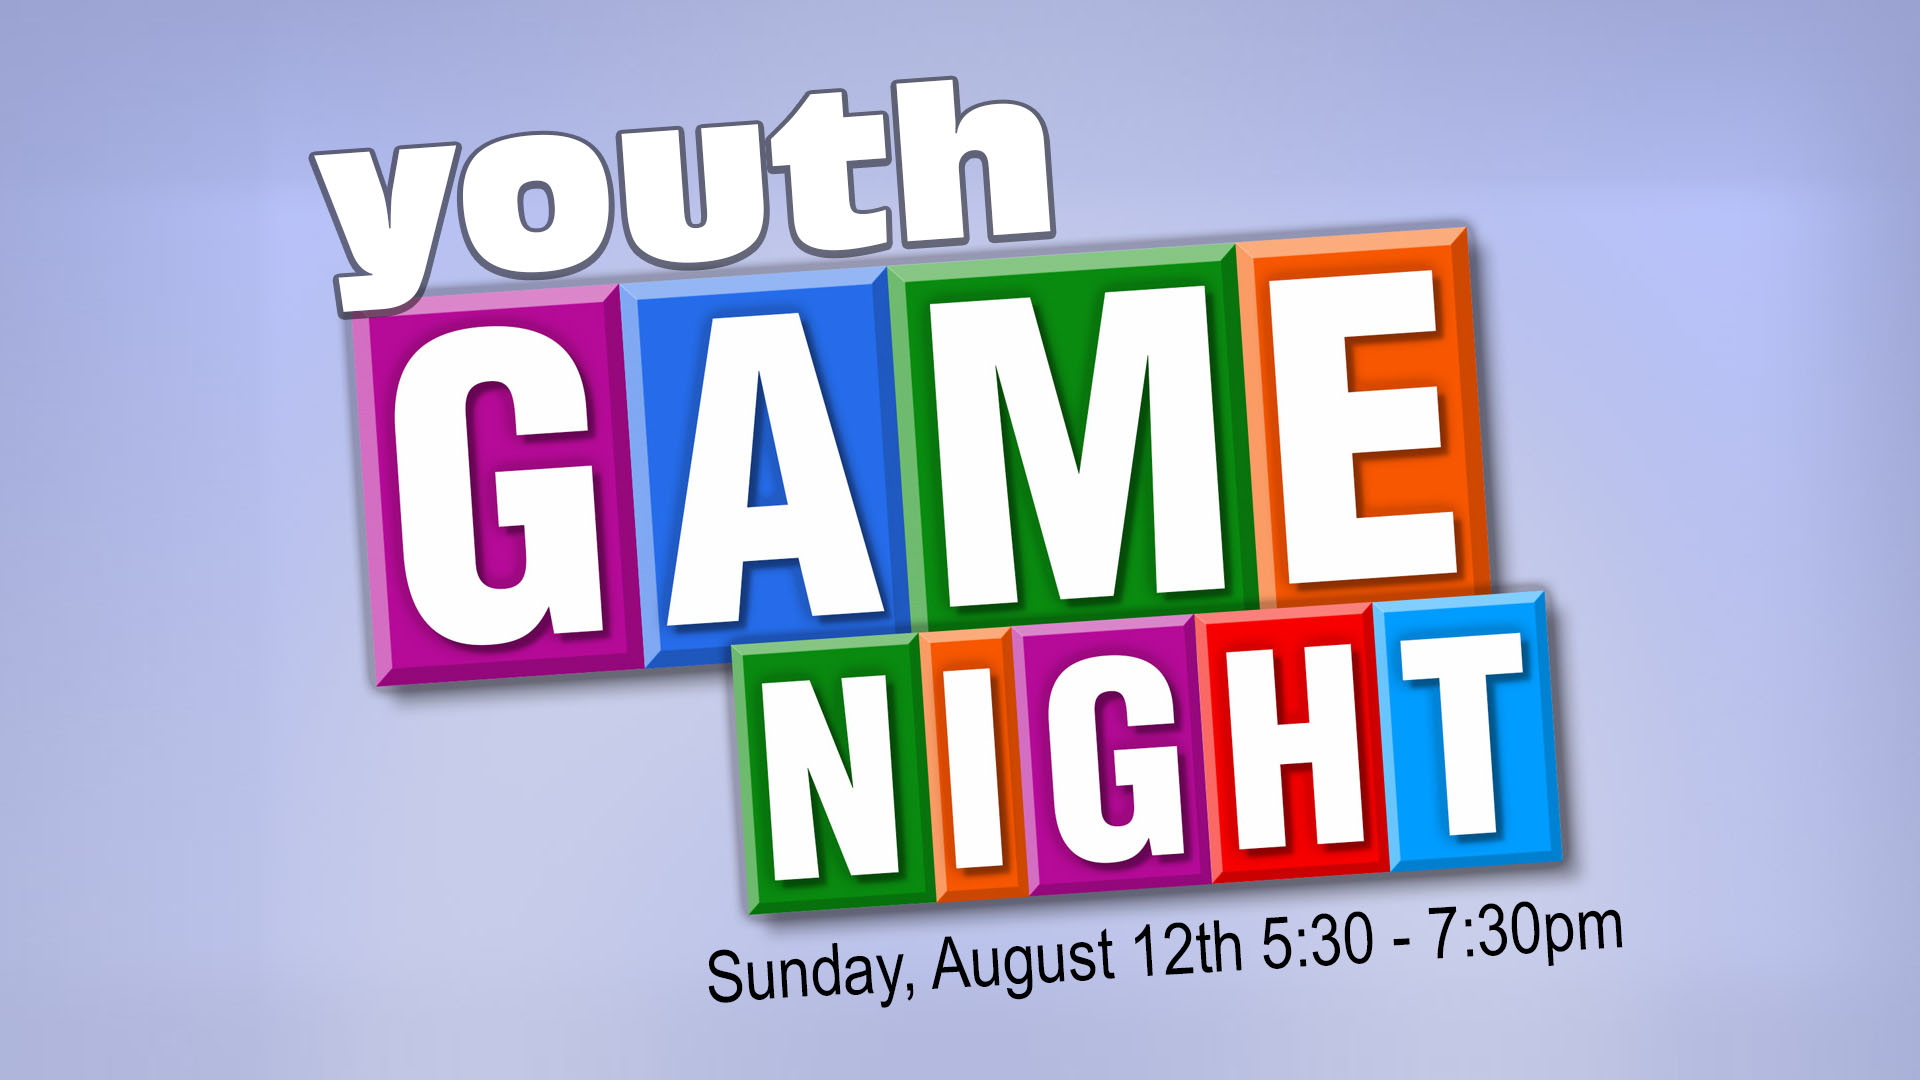 Youth Game Night Brandon Florida August 12, 2018